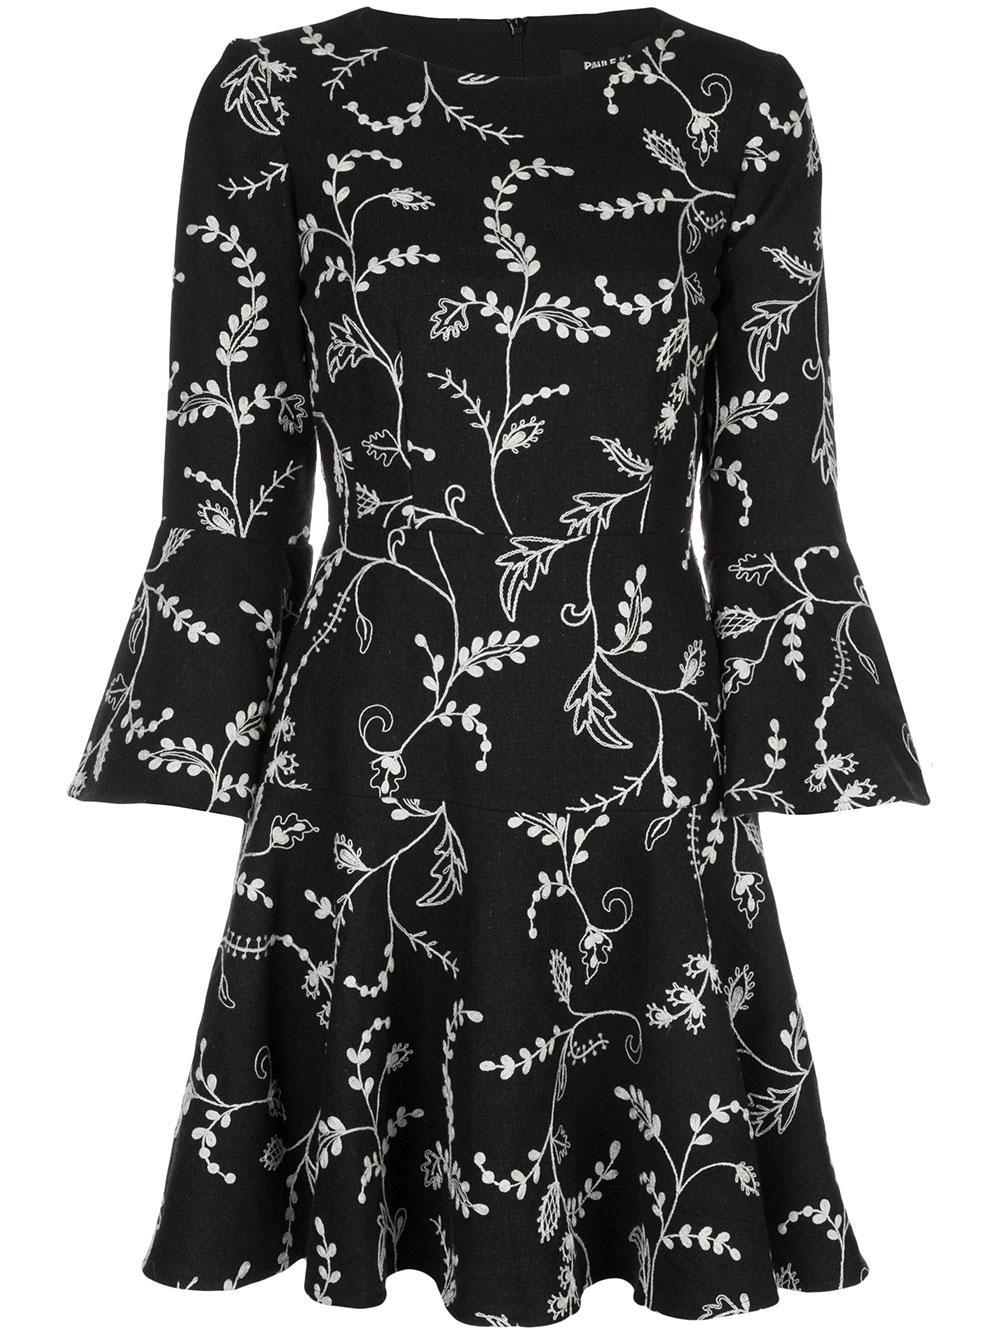 3/4 Sleeve Floral Print Dress With Ruffle Hem Item # 687/R171